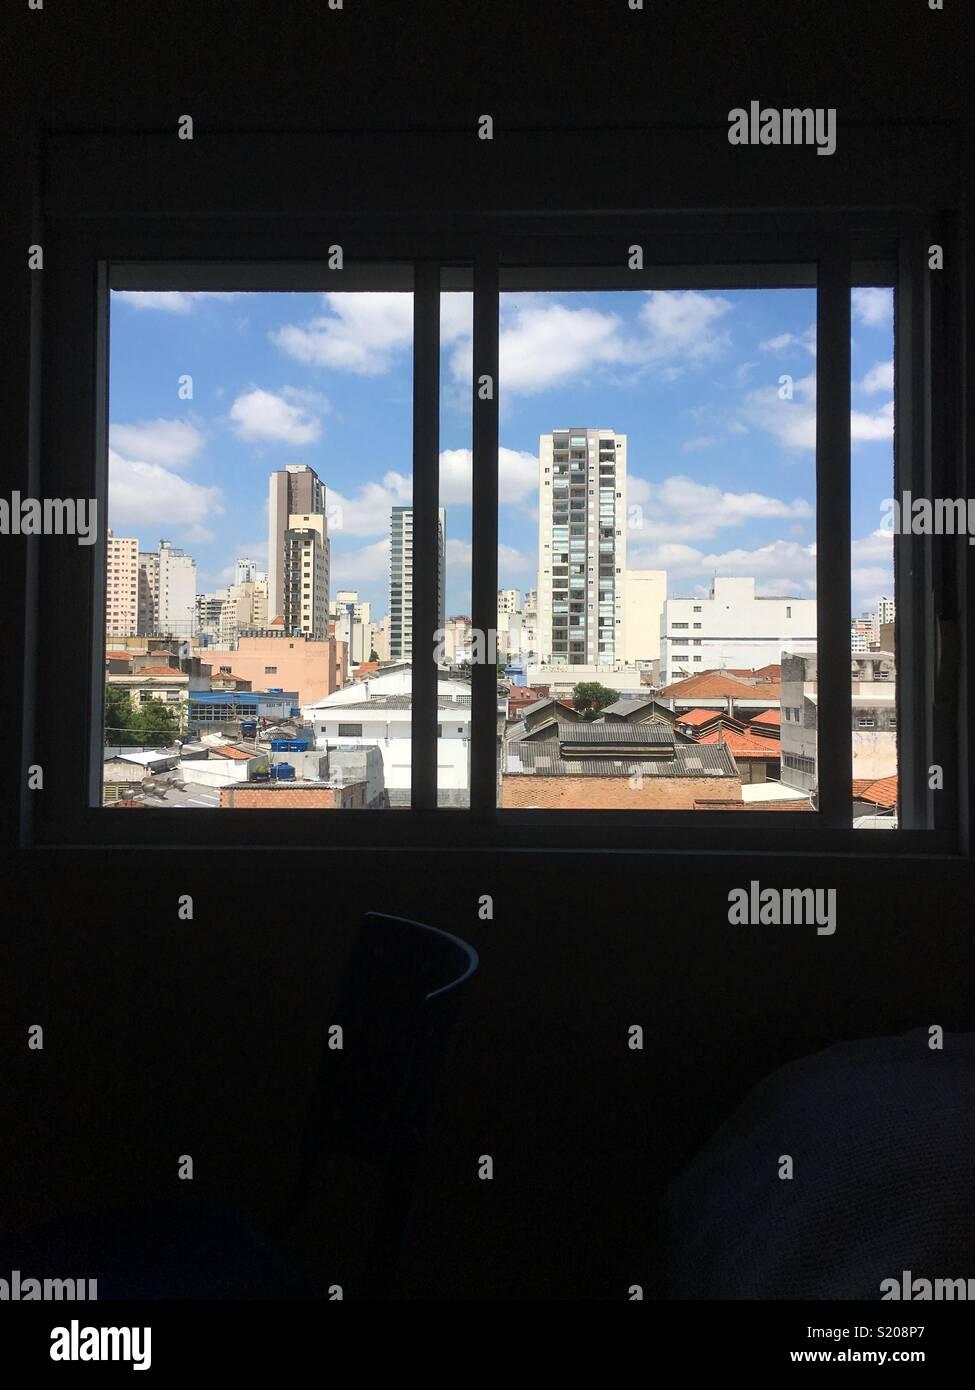 Fenster anzeigen Stockbild